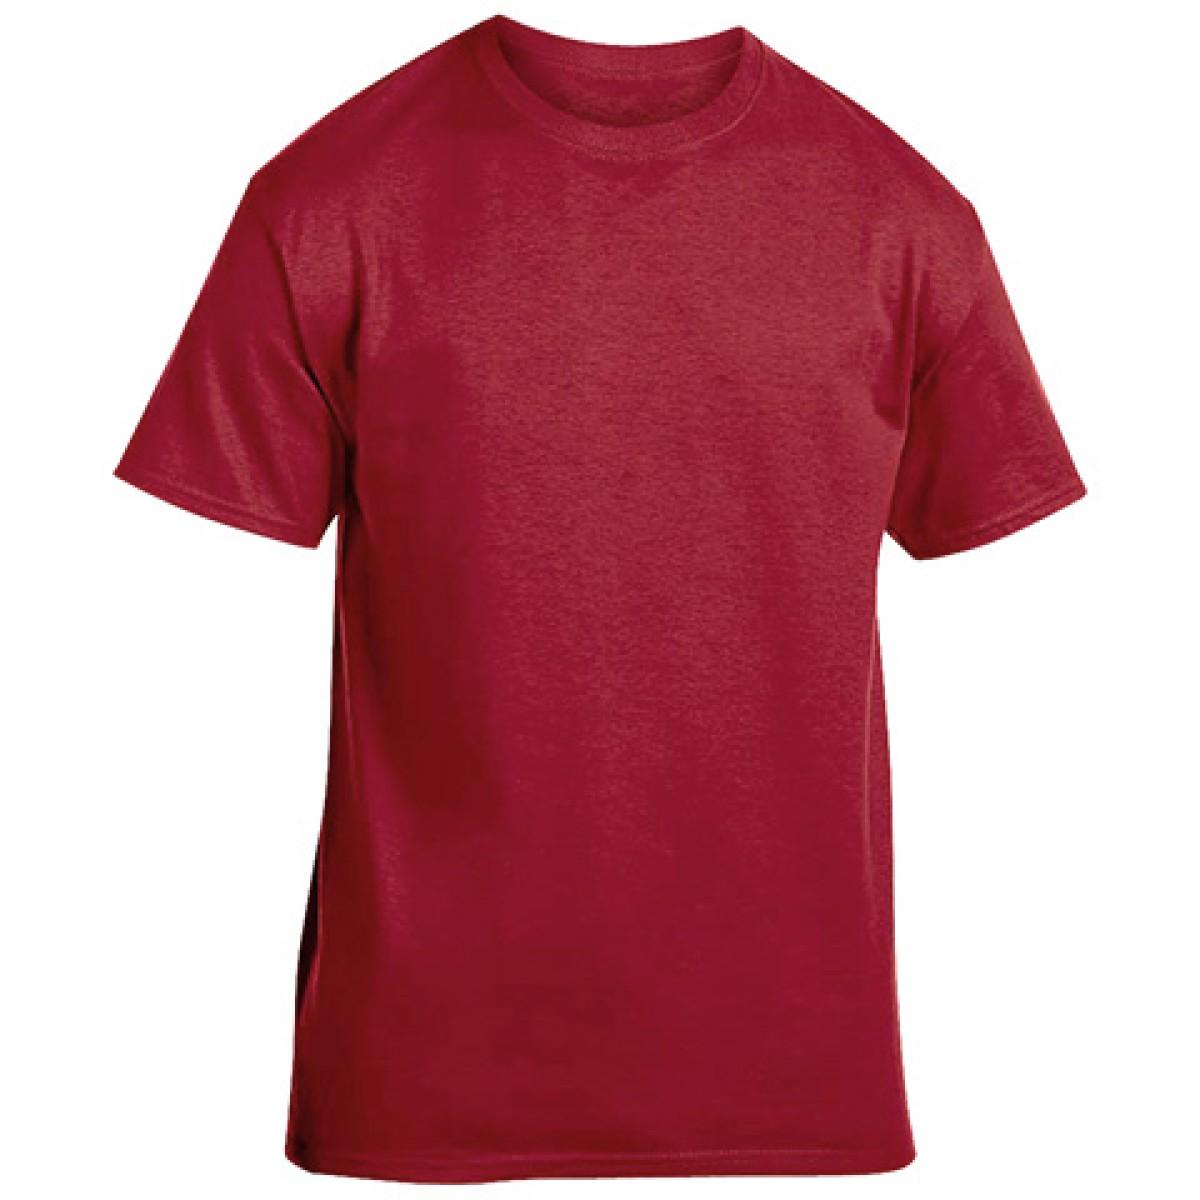 Soft 100% Cotton T-Shirt-Cardinal Red-YM